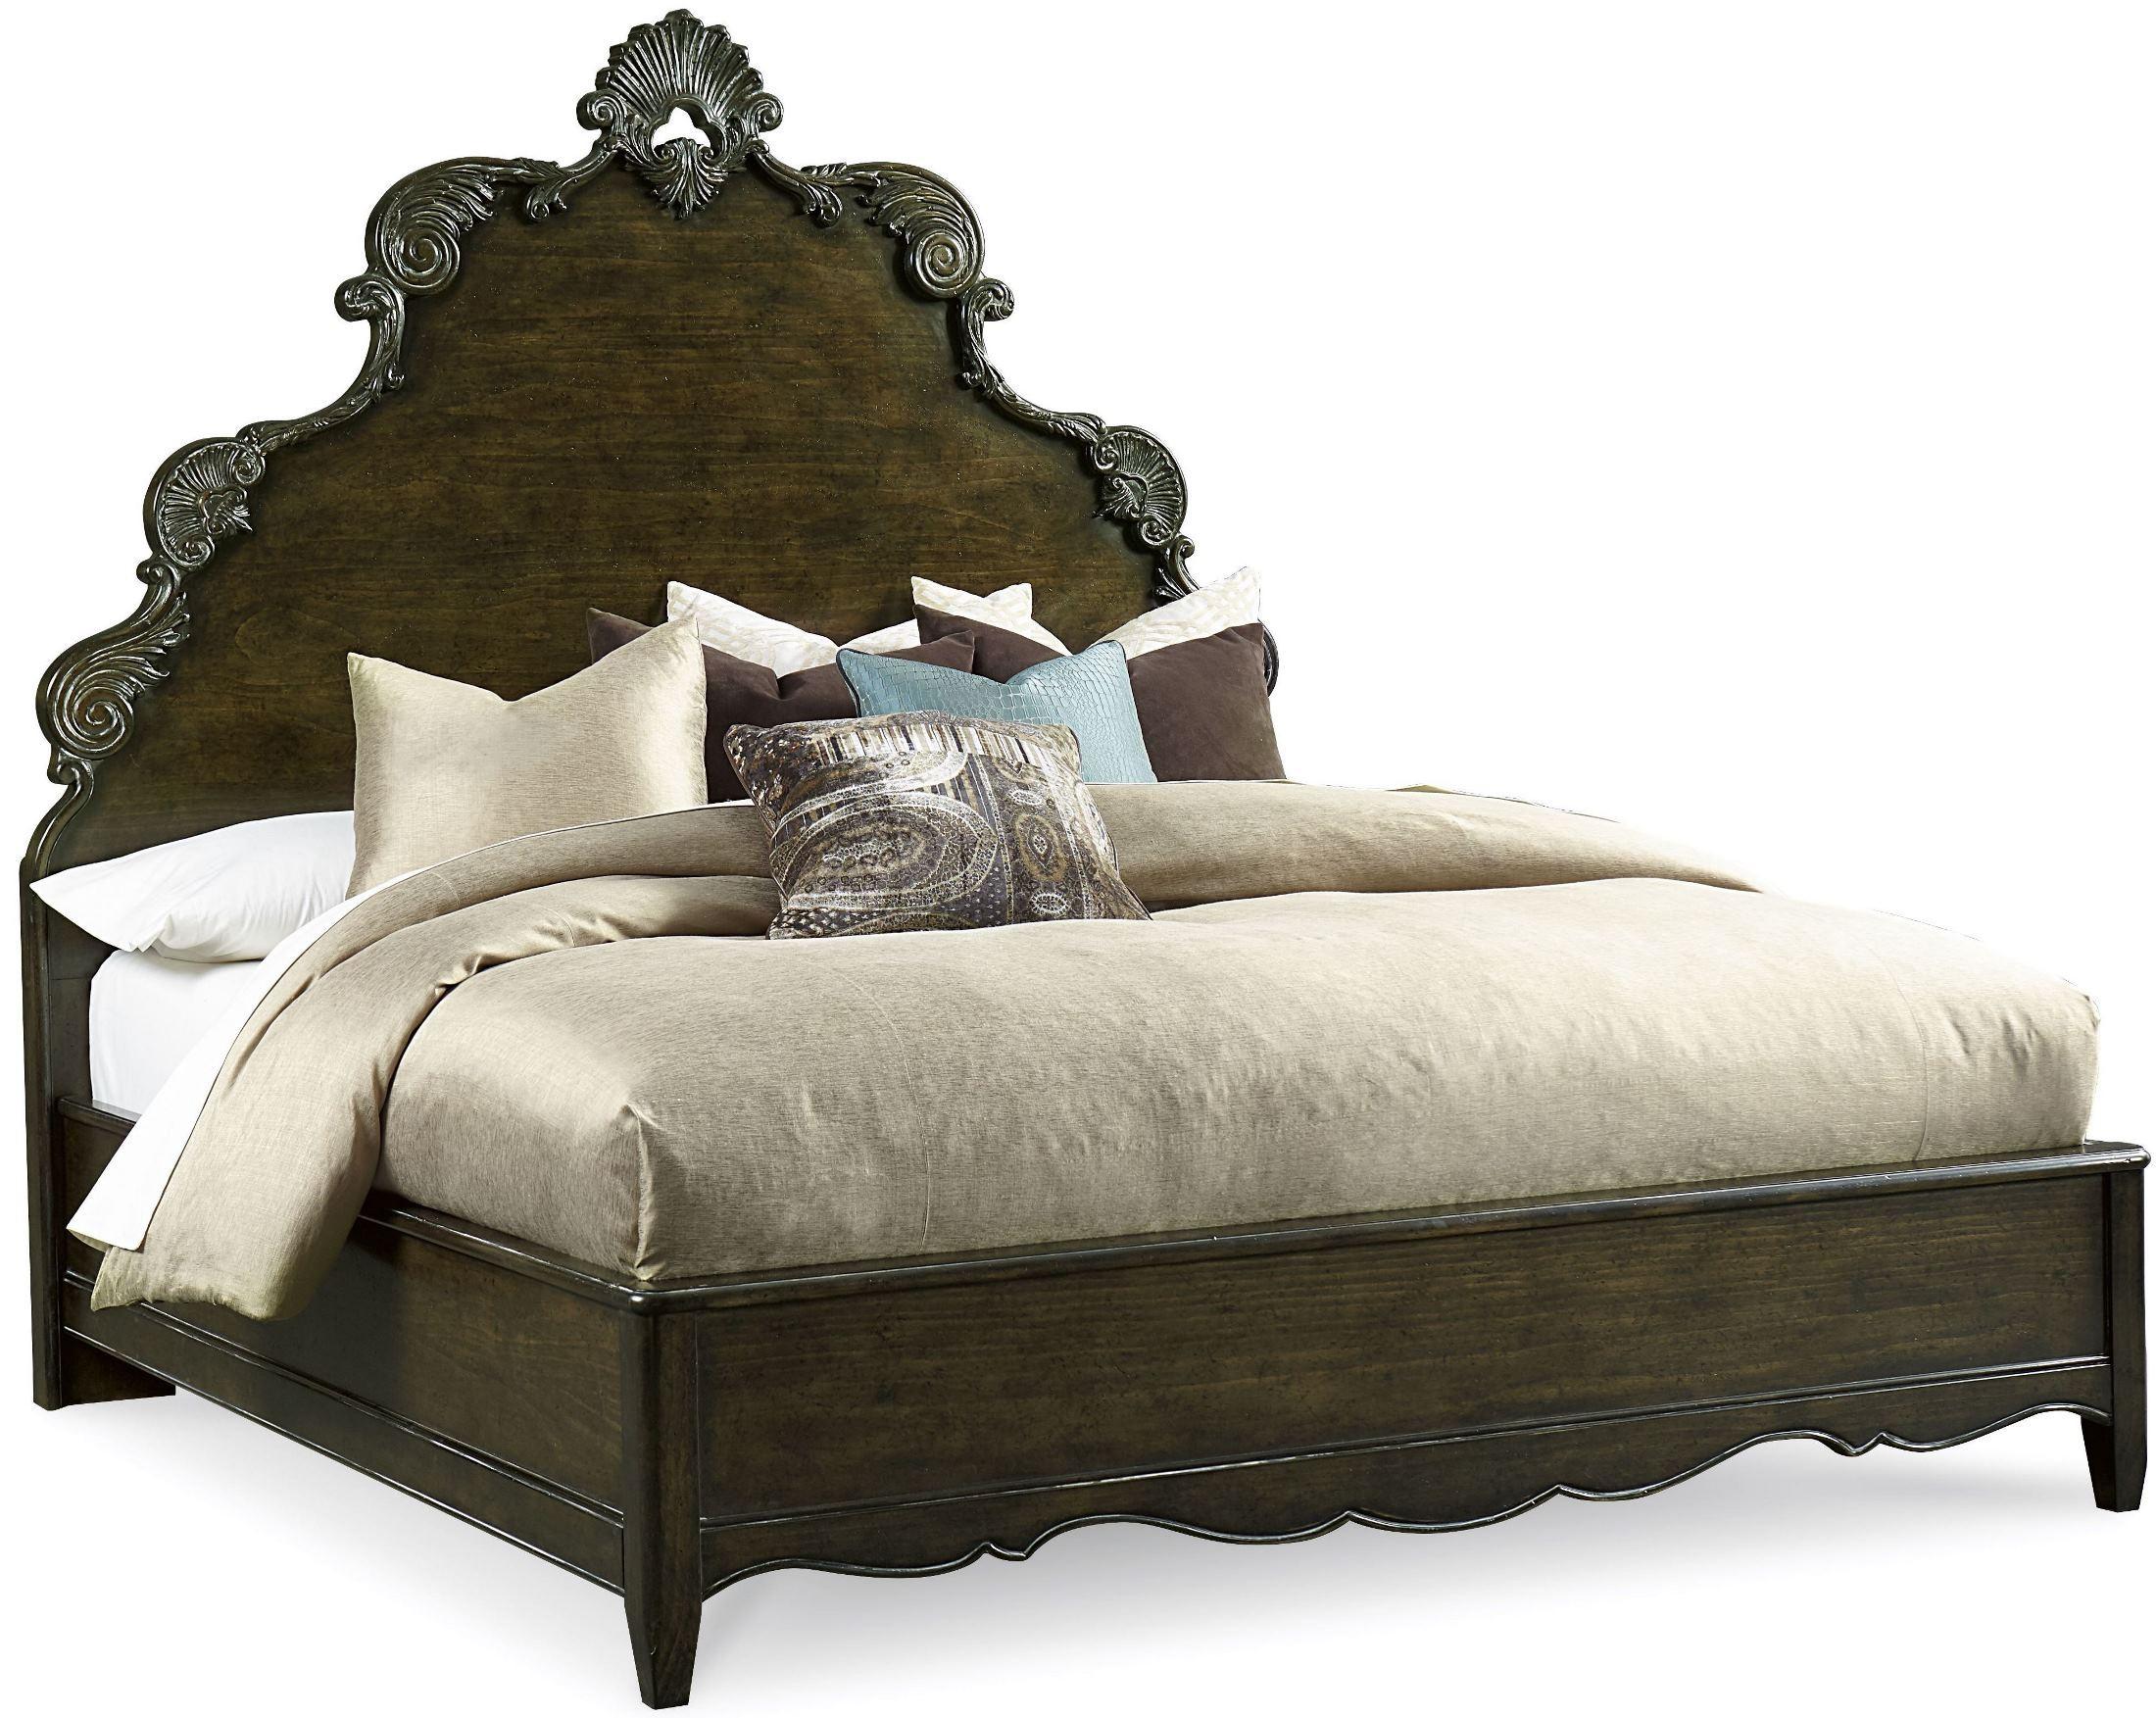 Continental Vintage Melange Cal King Panel Bed From Art